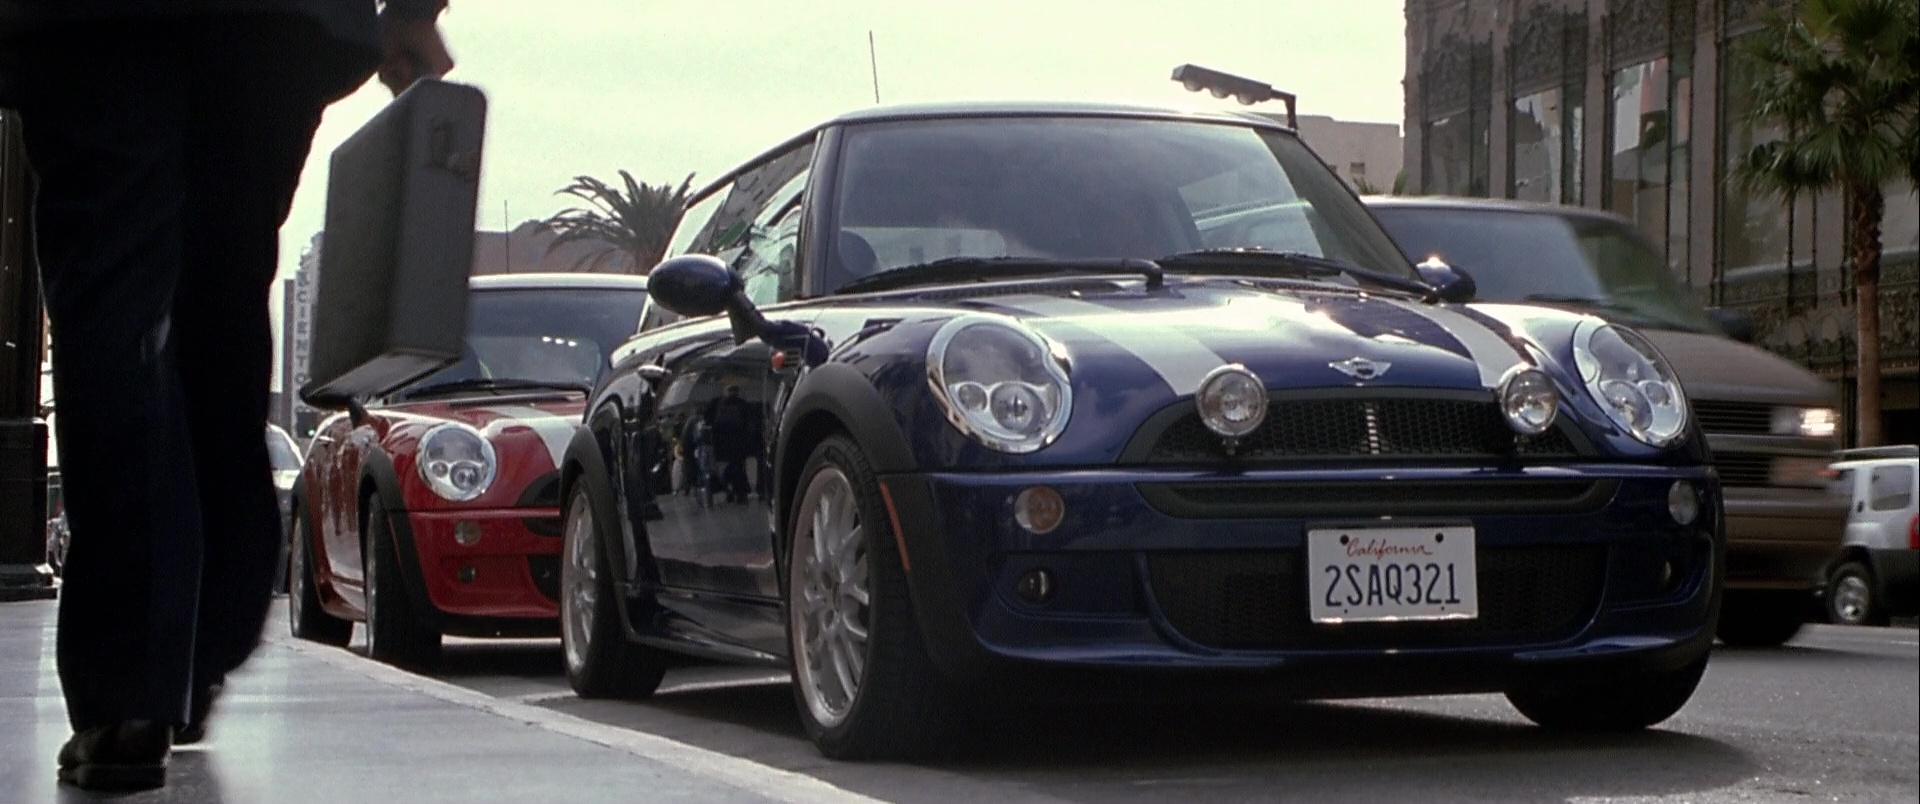 Cars In Italian Job Movie Mythbusters Comic Con 2011 Trailer